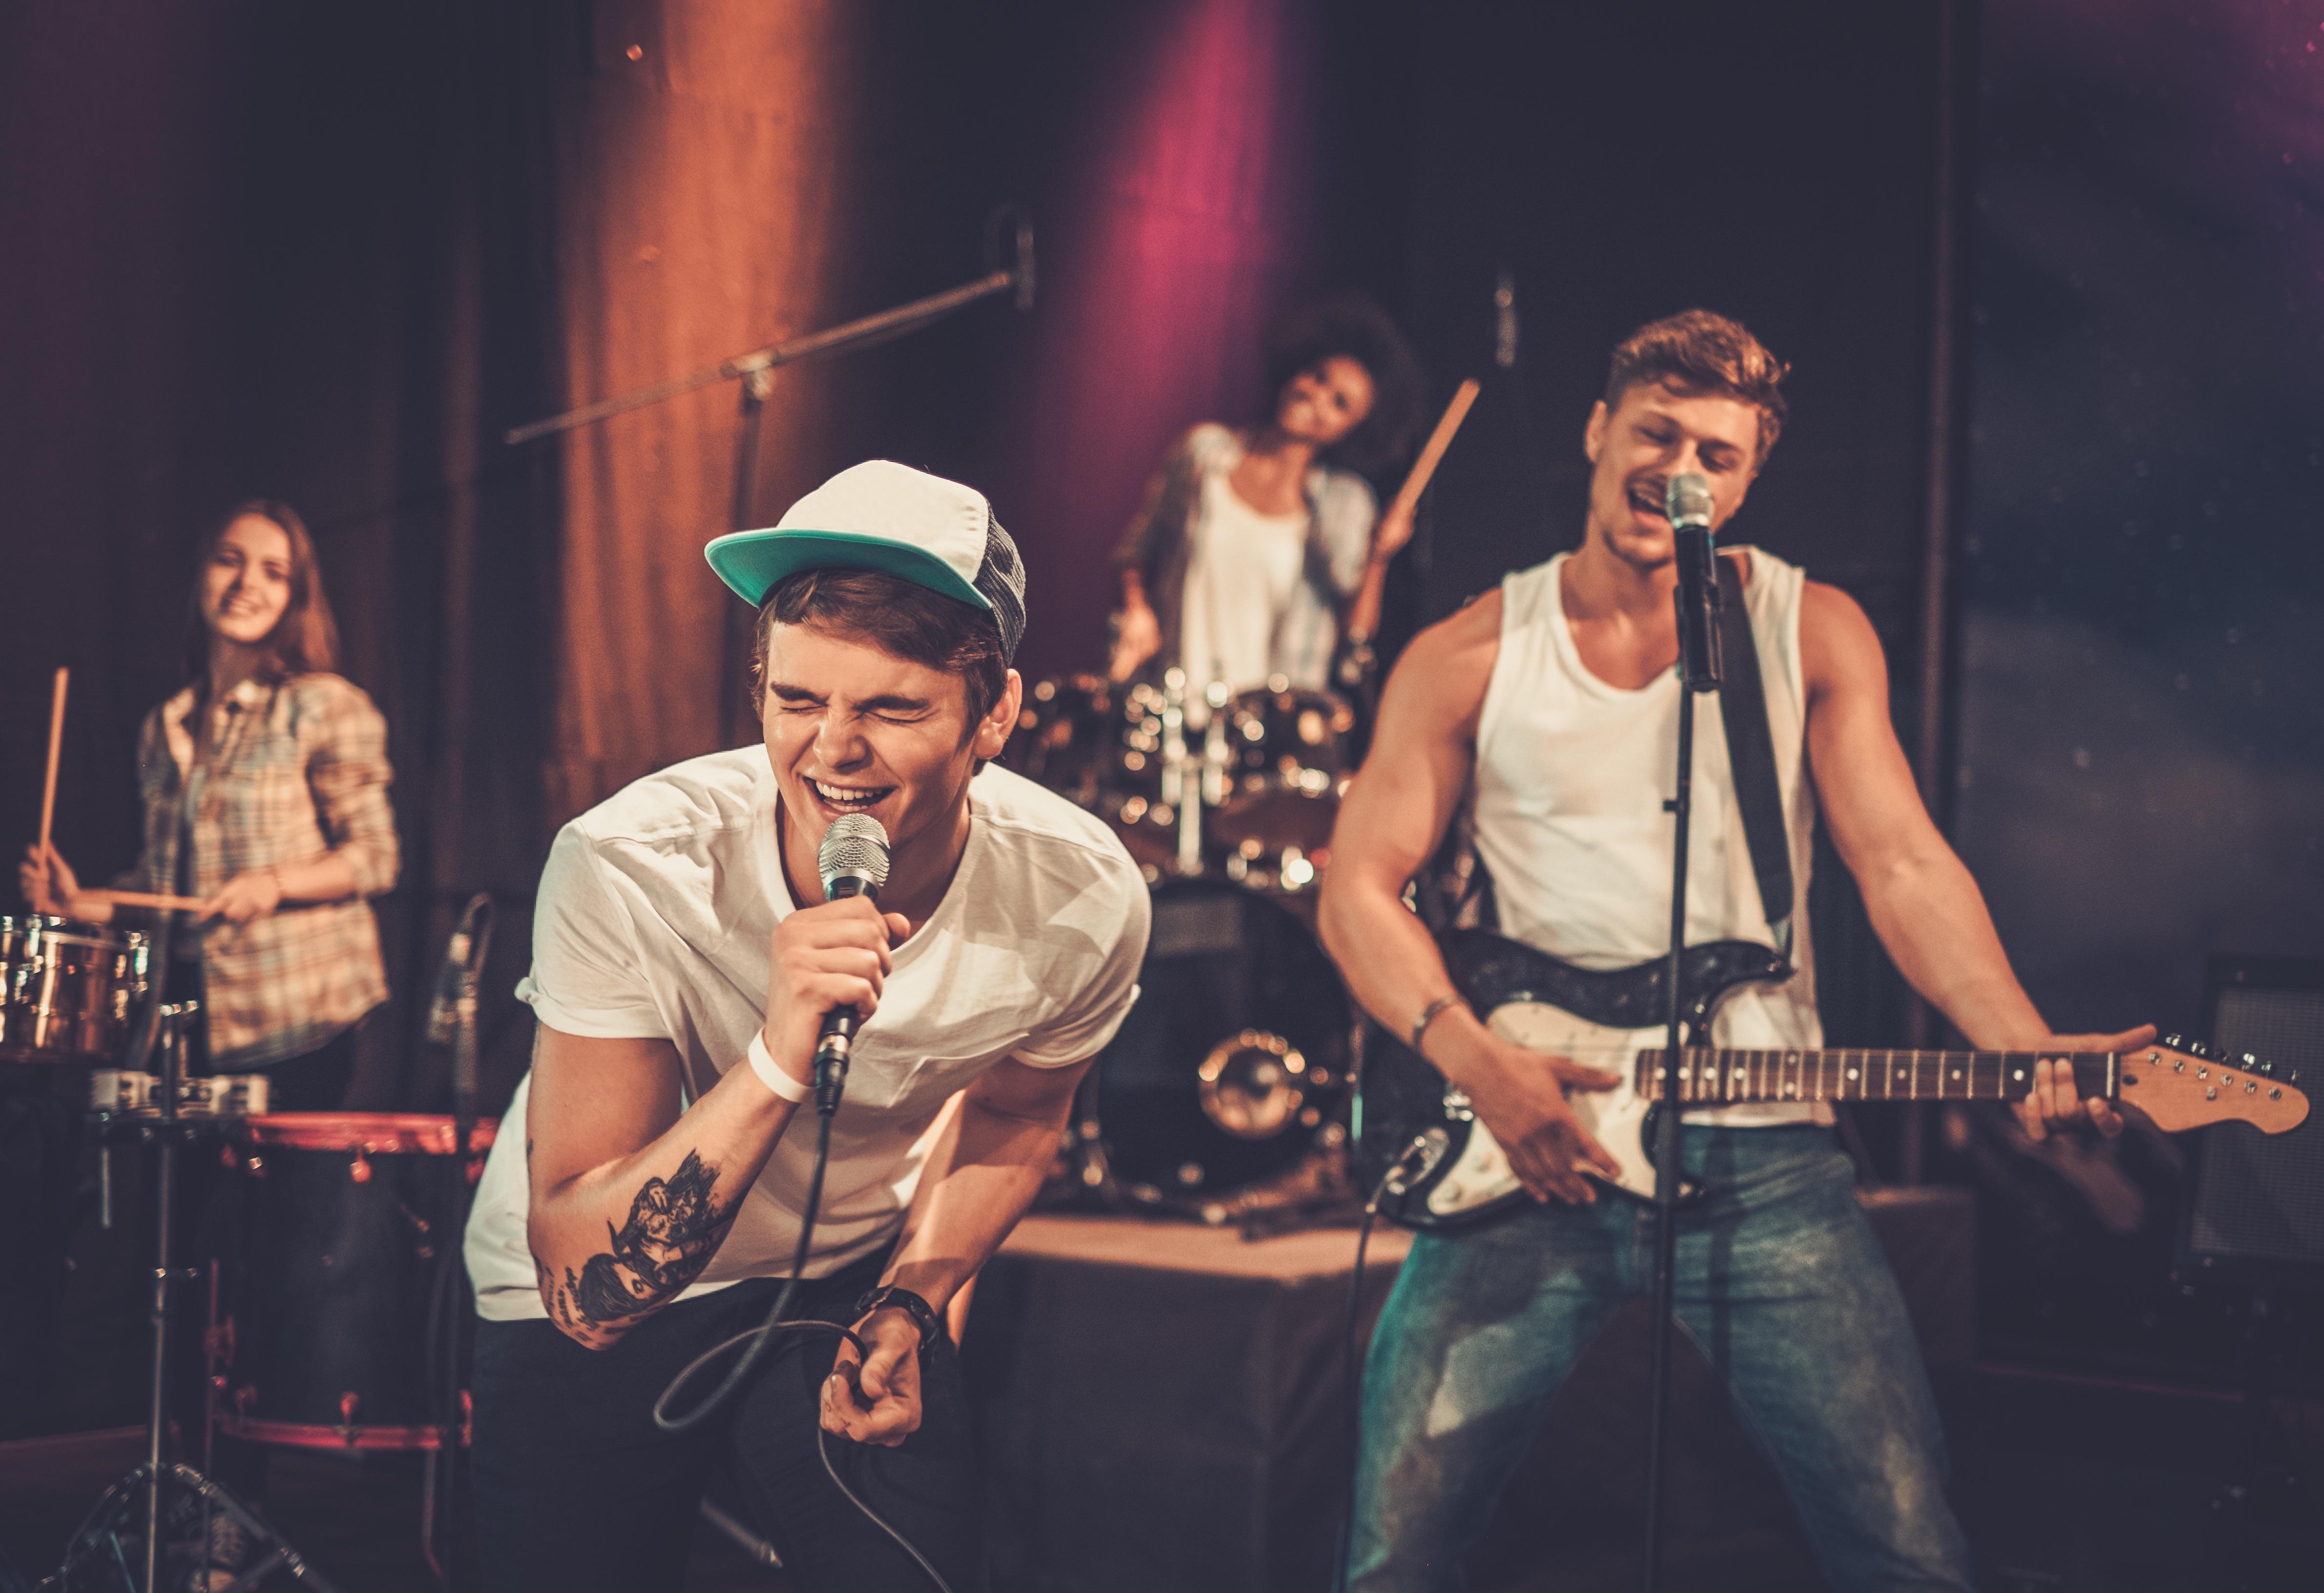 concert_performance